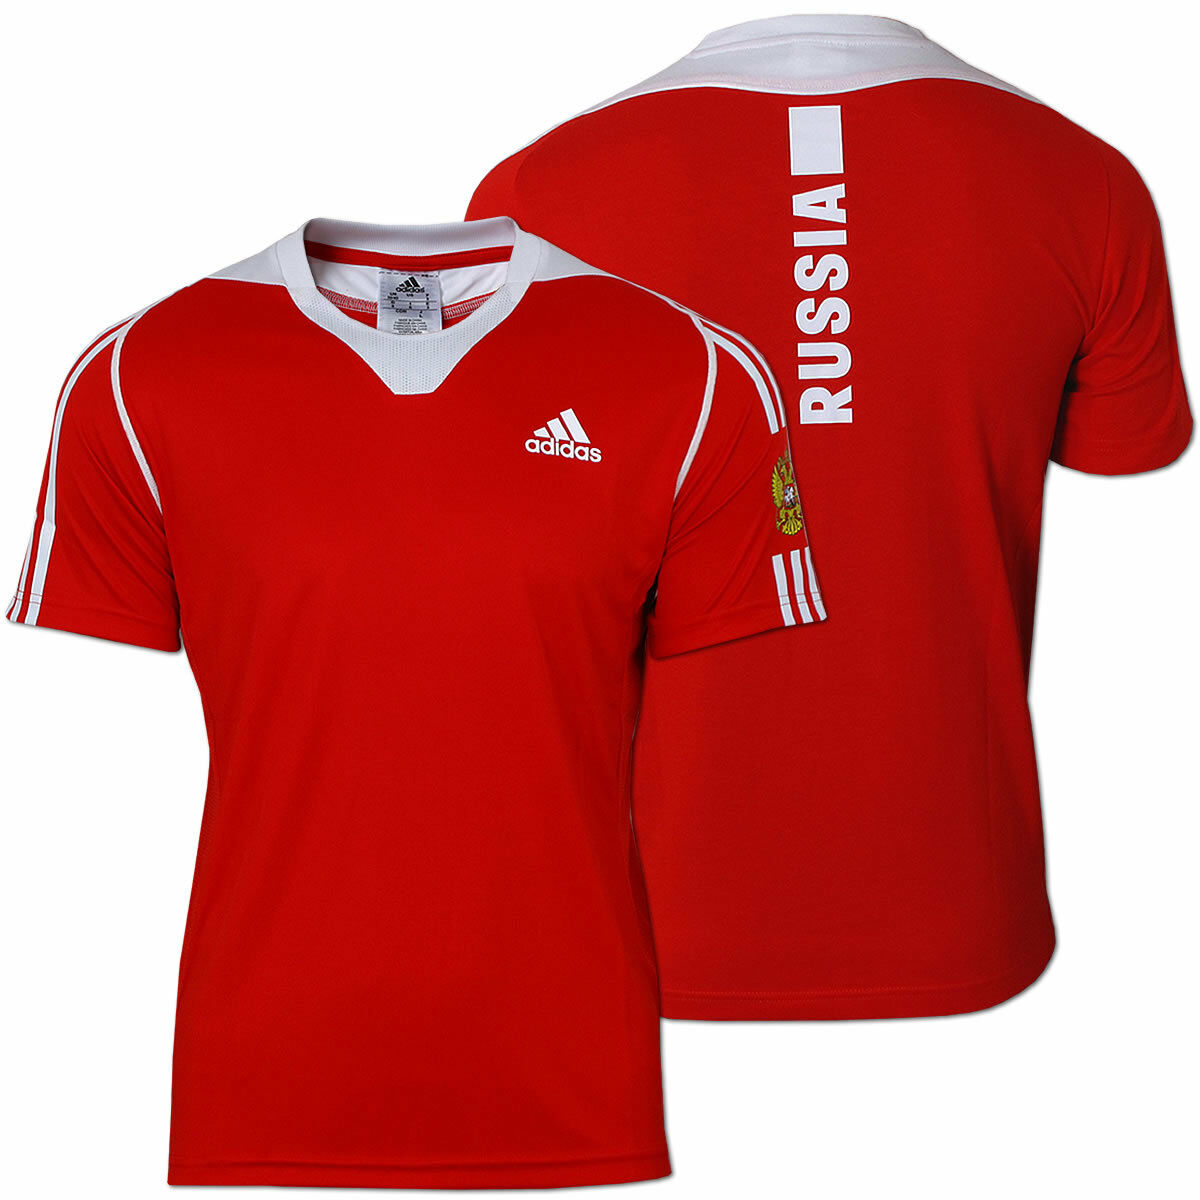 Adidas Herren Team Shirt Russia Funktions Shirt Russland Präsentation Präsentation Präsentation rot-weiß  | Charakteristisch  2ed0b4